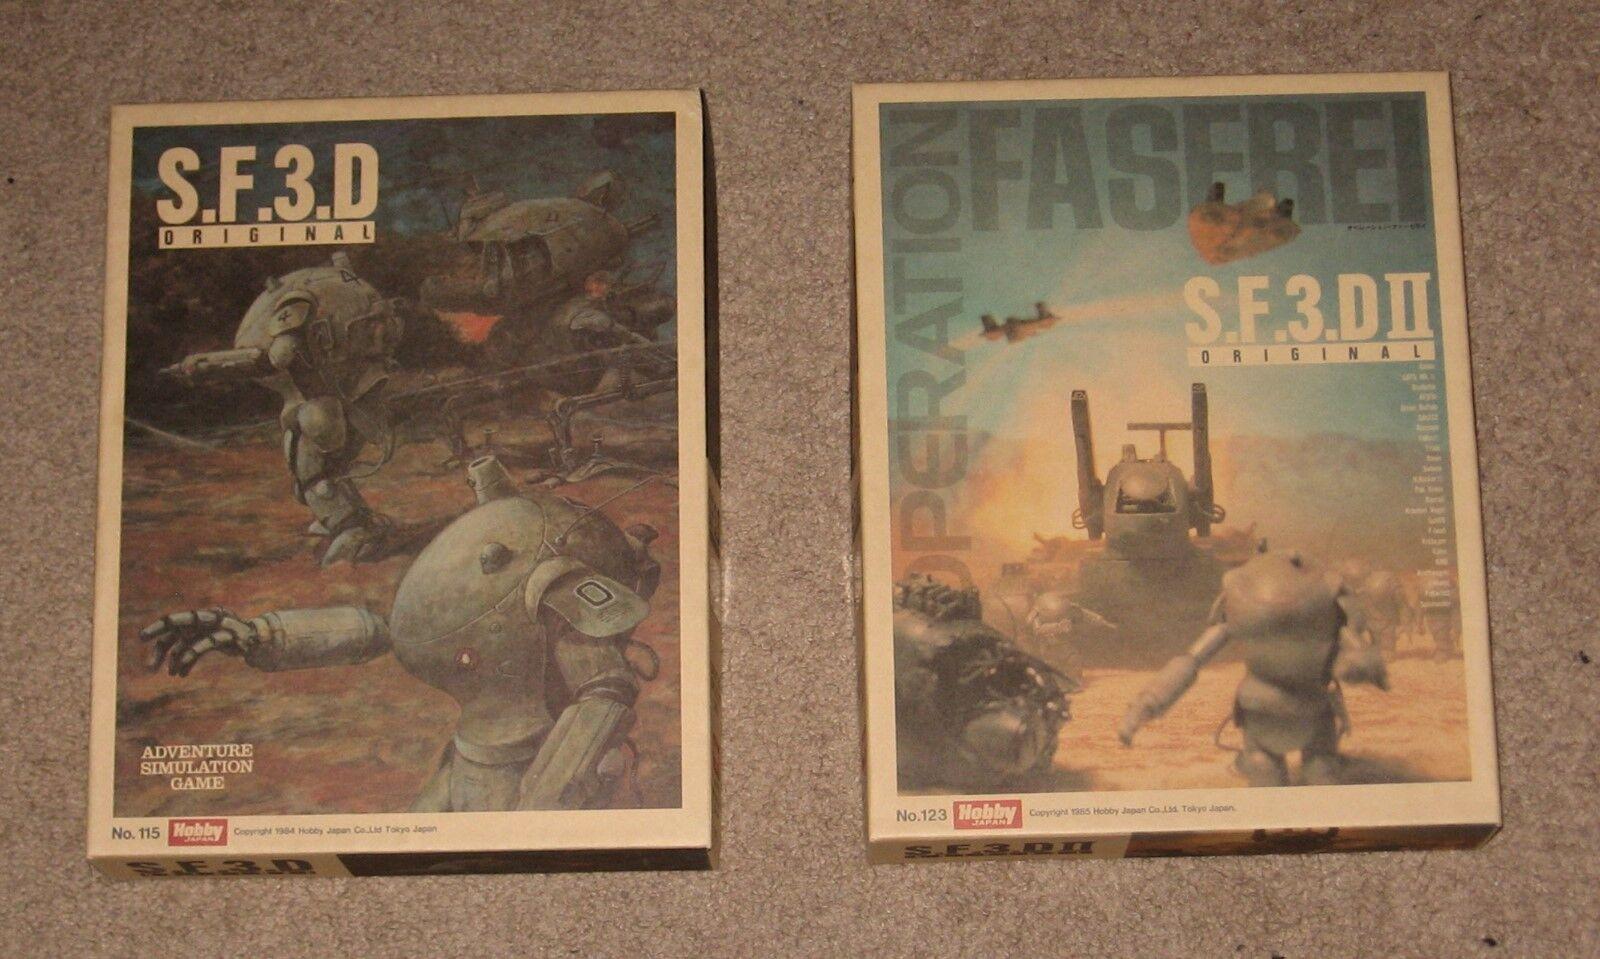 SF3D MA. K ZvB3000 & S.F.3.D II Opération faserei-Hobby Japan jeux non perforé